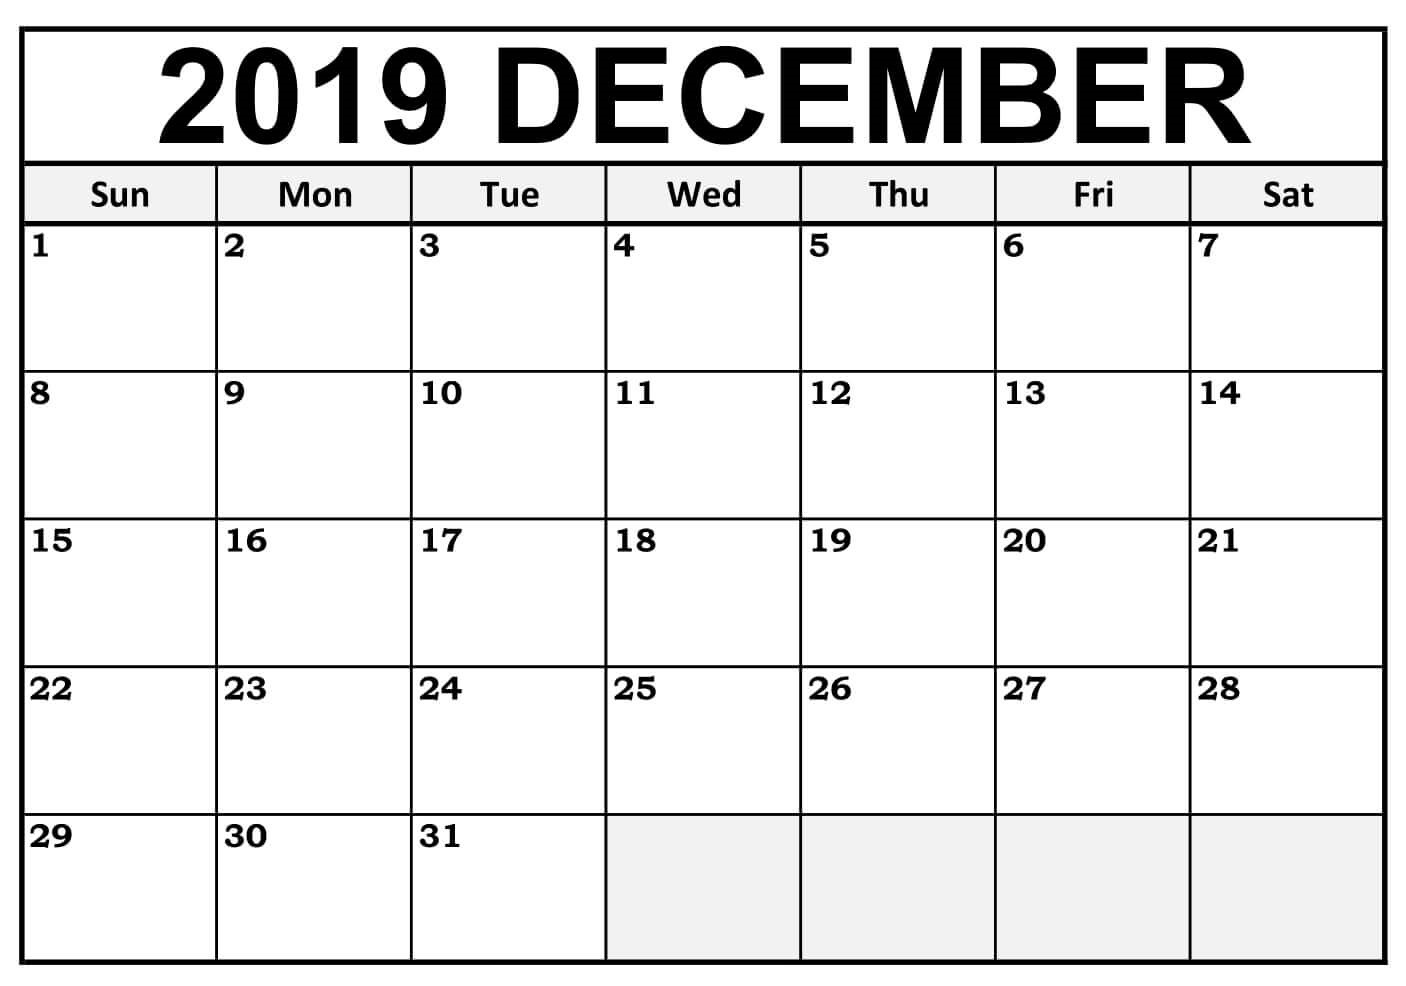 Blank December 2019 Calendar Printable Template